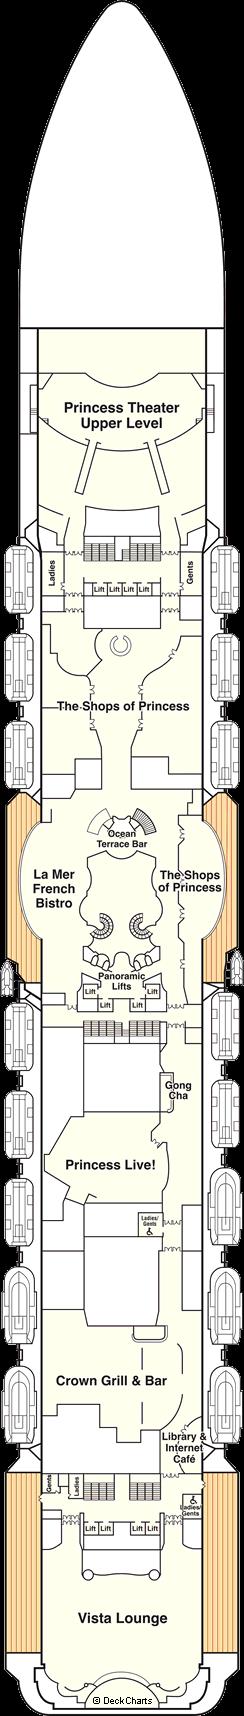 Majestic Princess: Promenade Deck